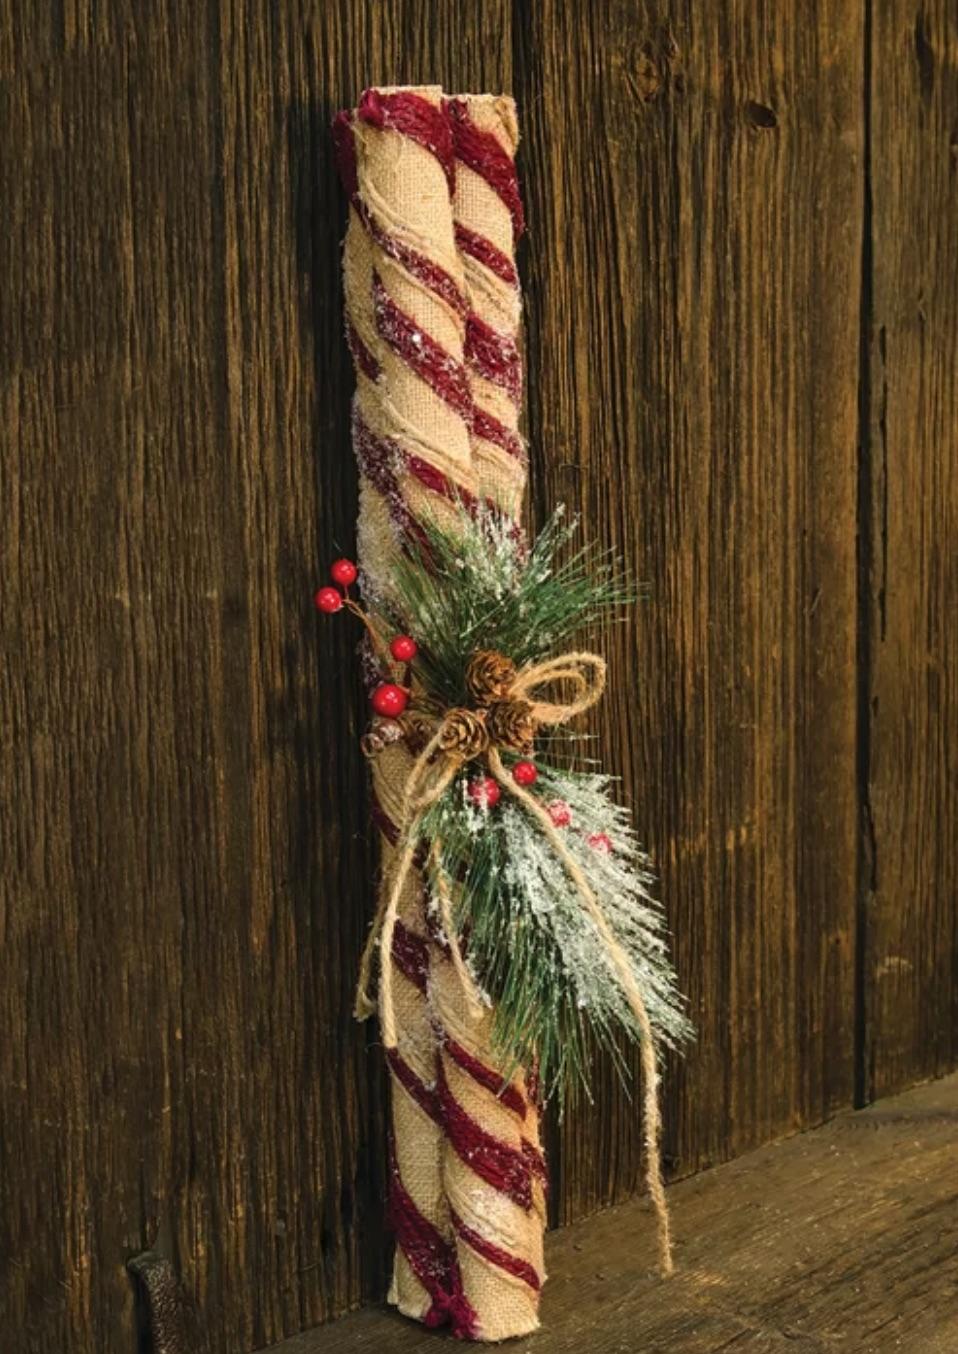 Farmhouse Christmas Decorations to Celebrate the Season Burlap Peppermint Sticks #Decor #Christmas #Farmhouse #ChristmasDecor #FarmhouseDecor #FarmhouseChristmasDecor #HolidayDecor